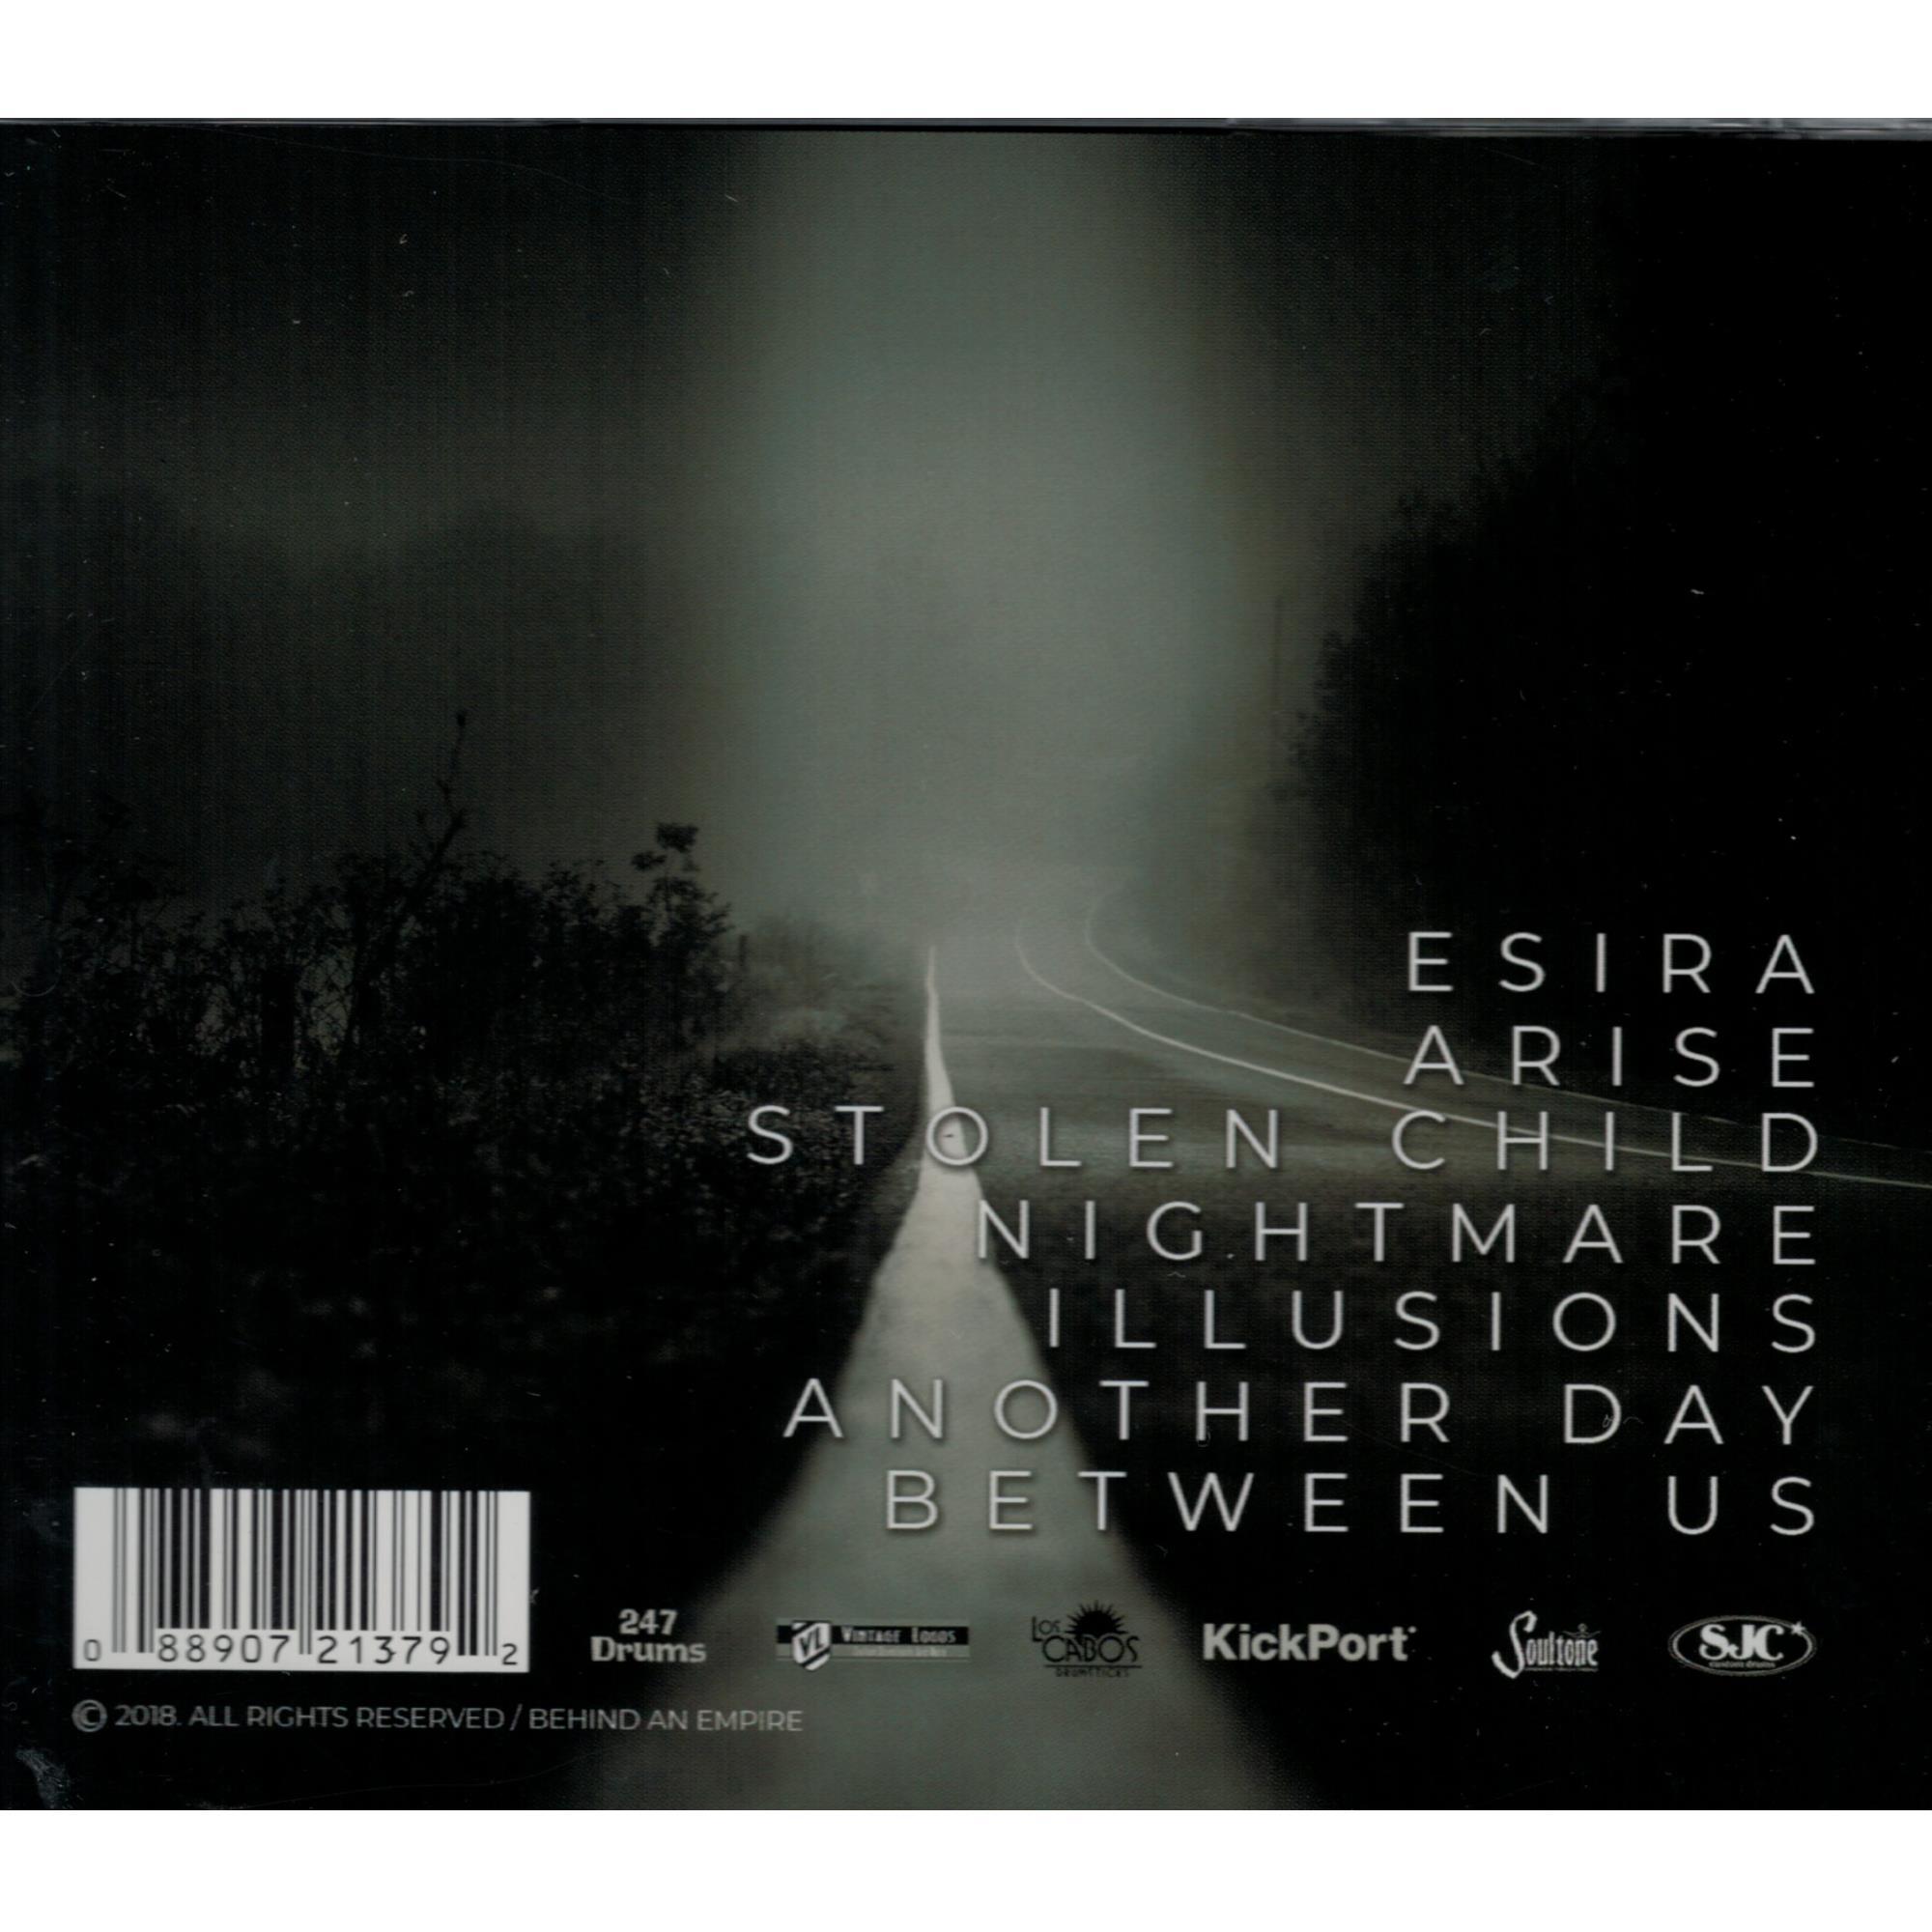 Ilusions CD